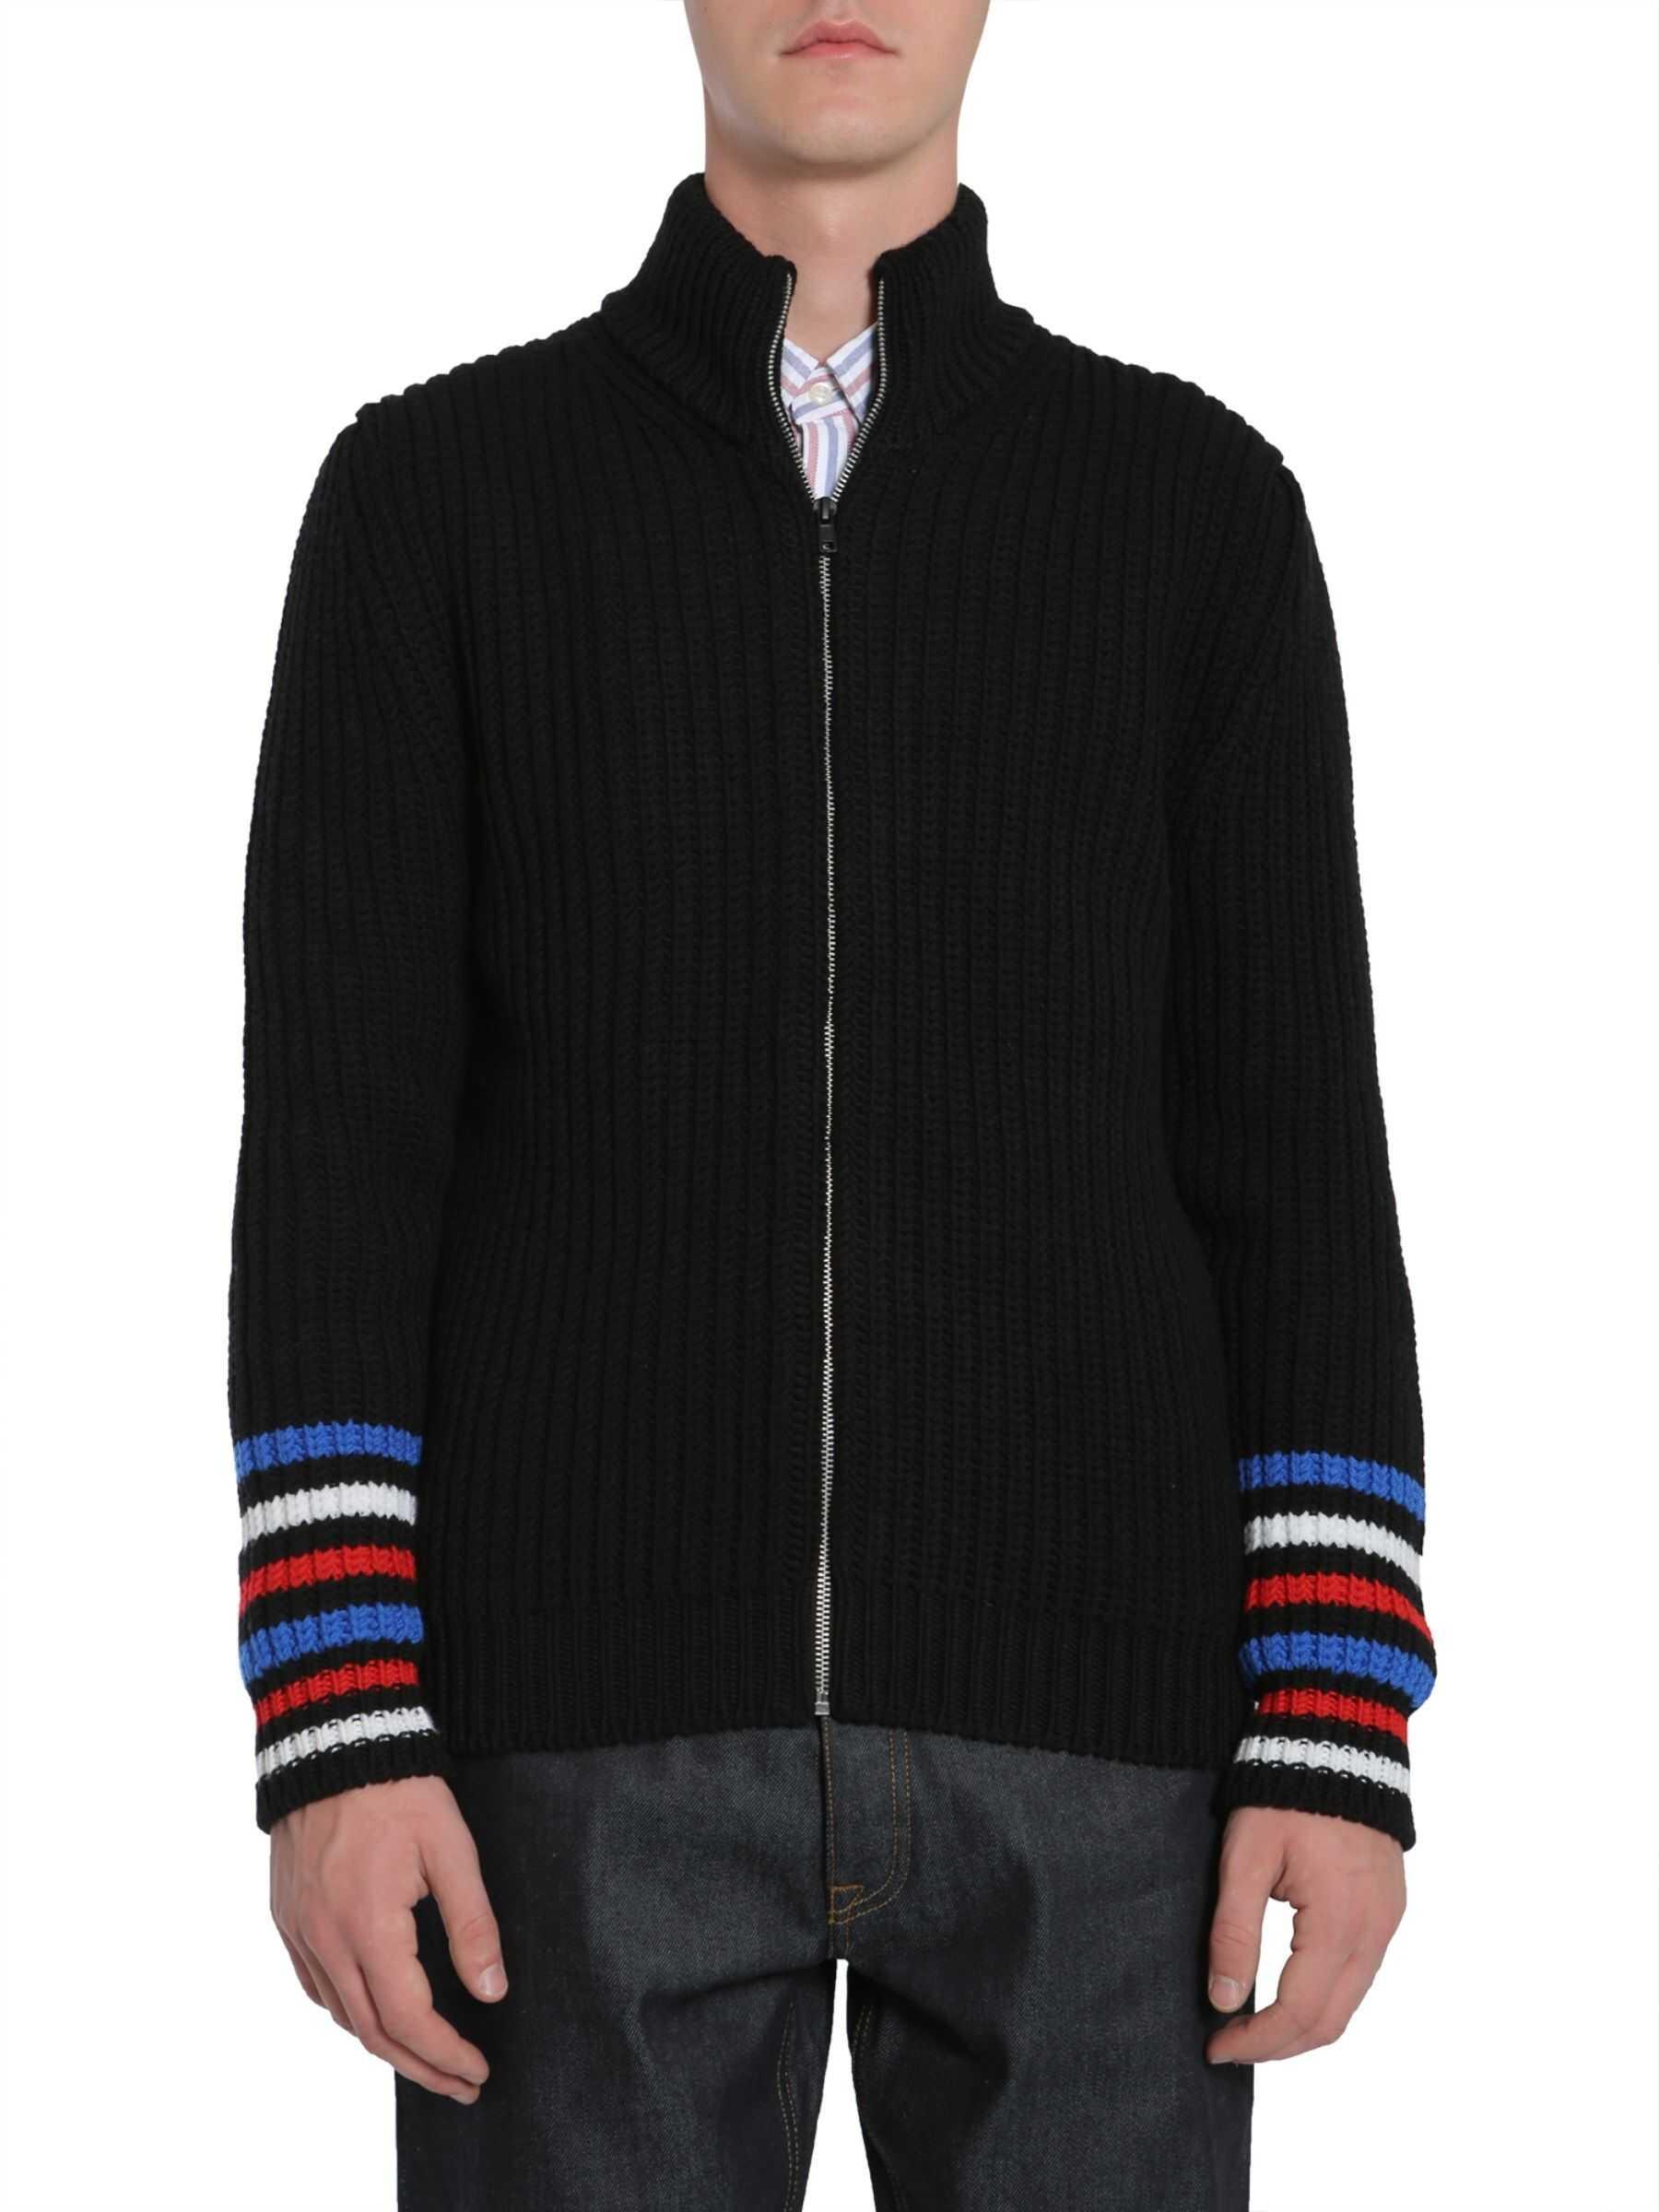 Tommy Hilfiger High Collar Sweater BLACK imagine